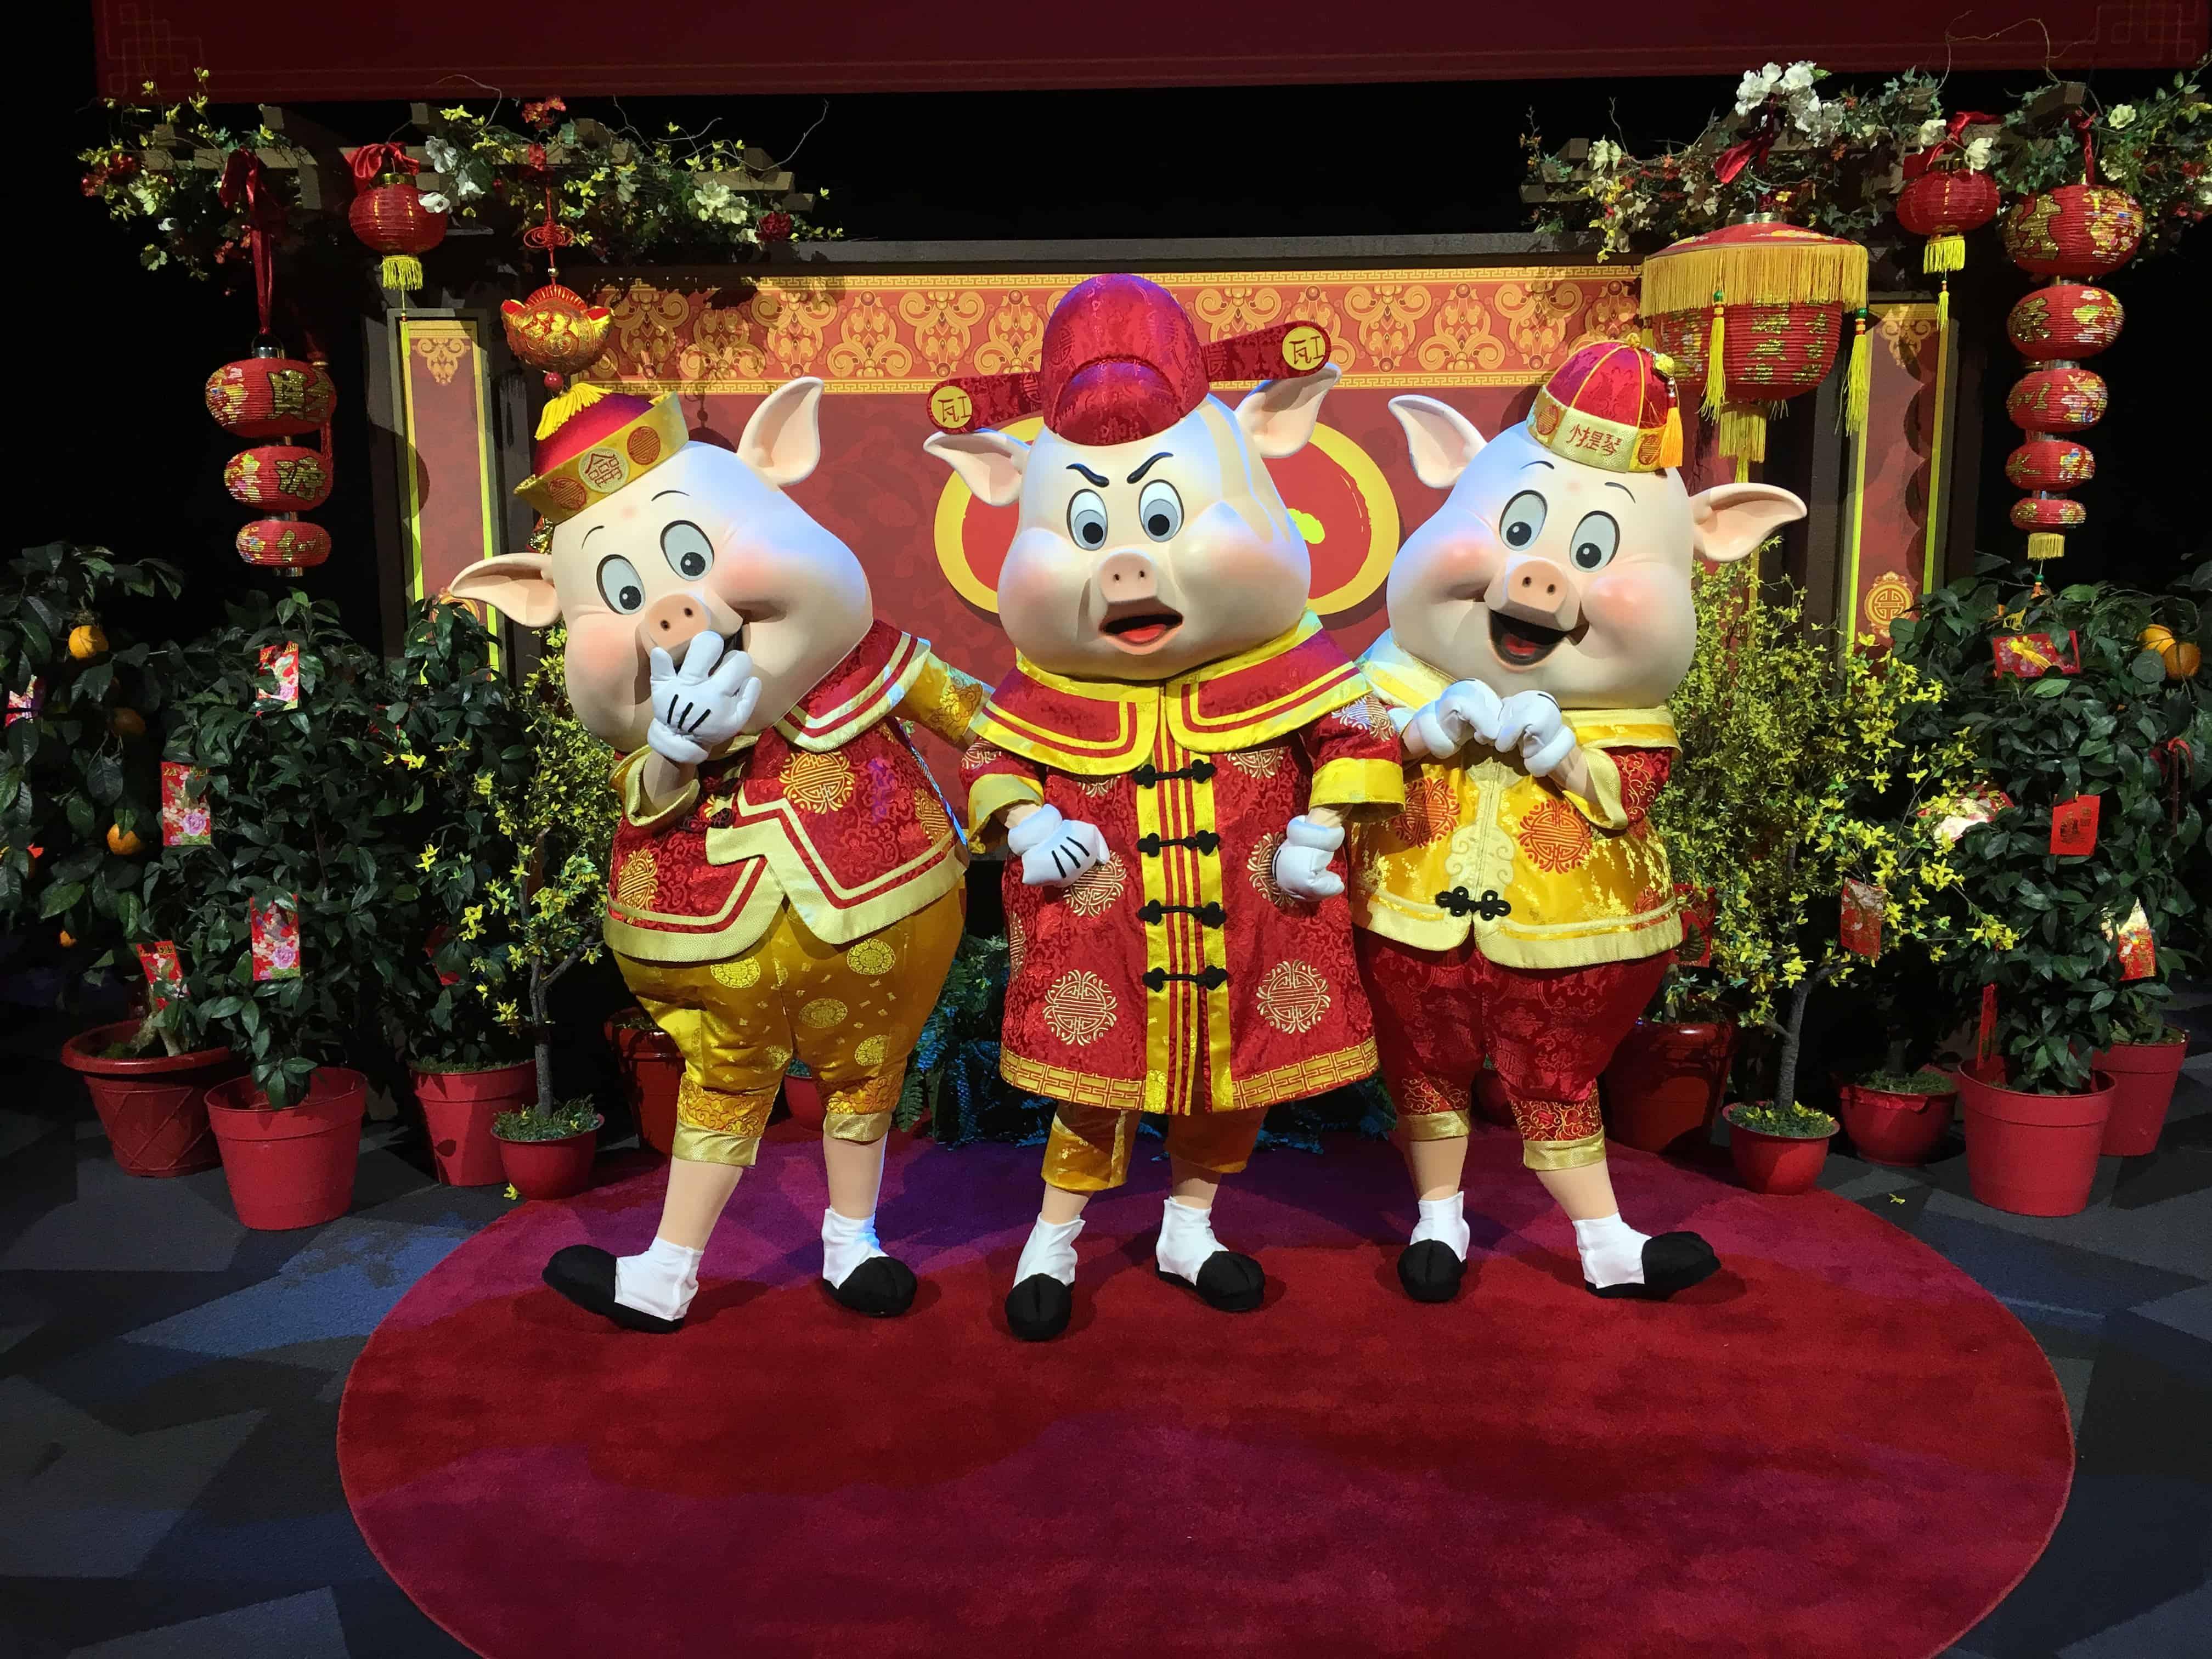 Disney three little pigs